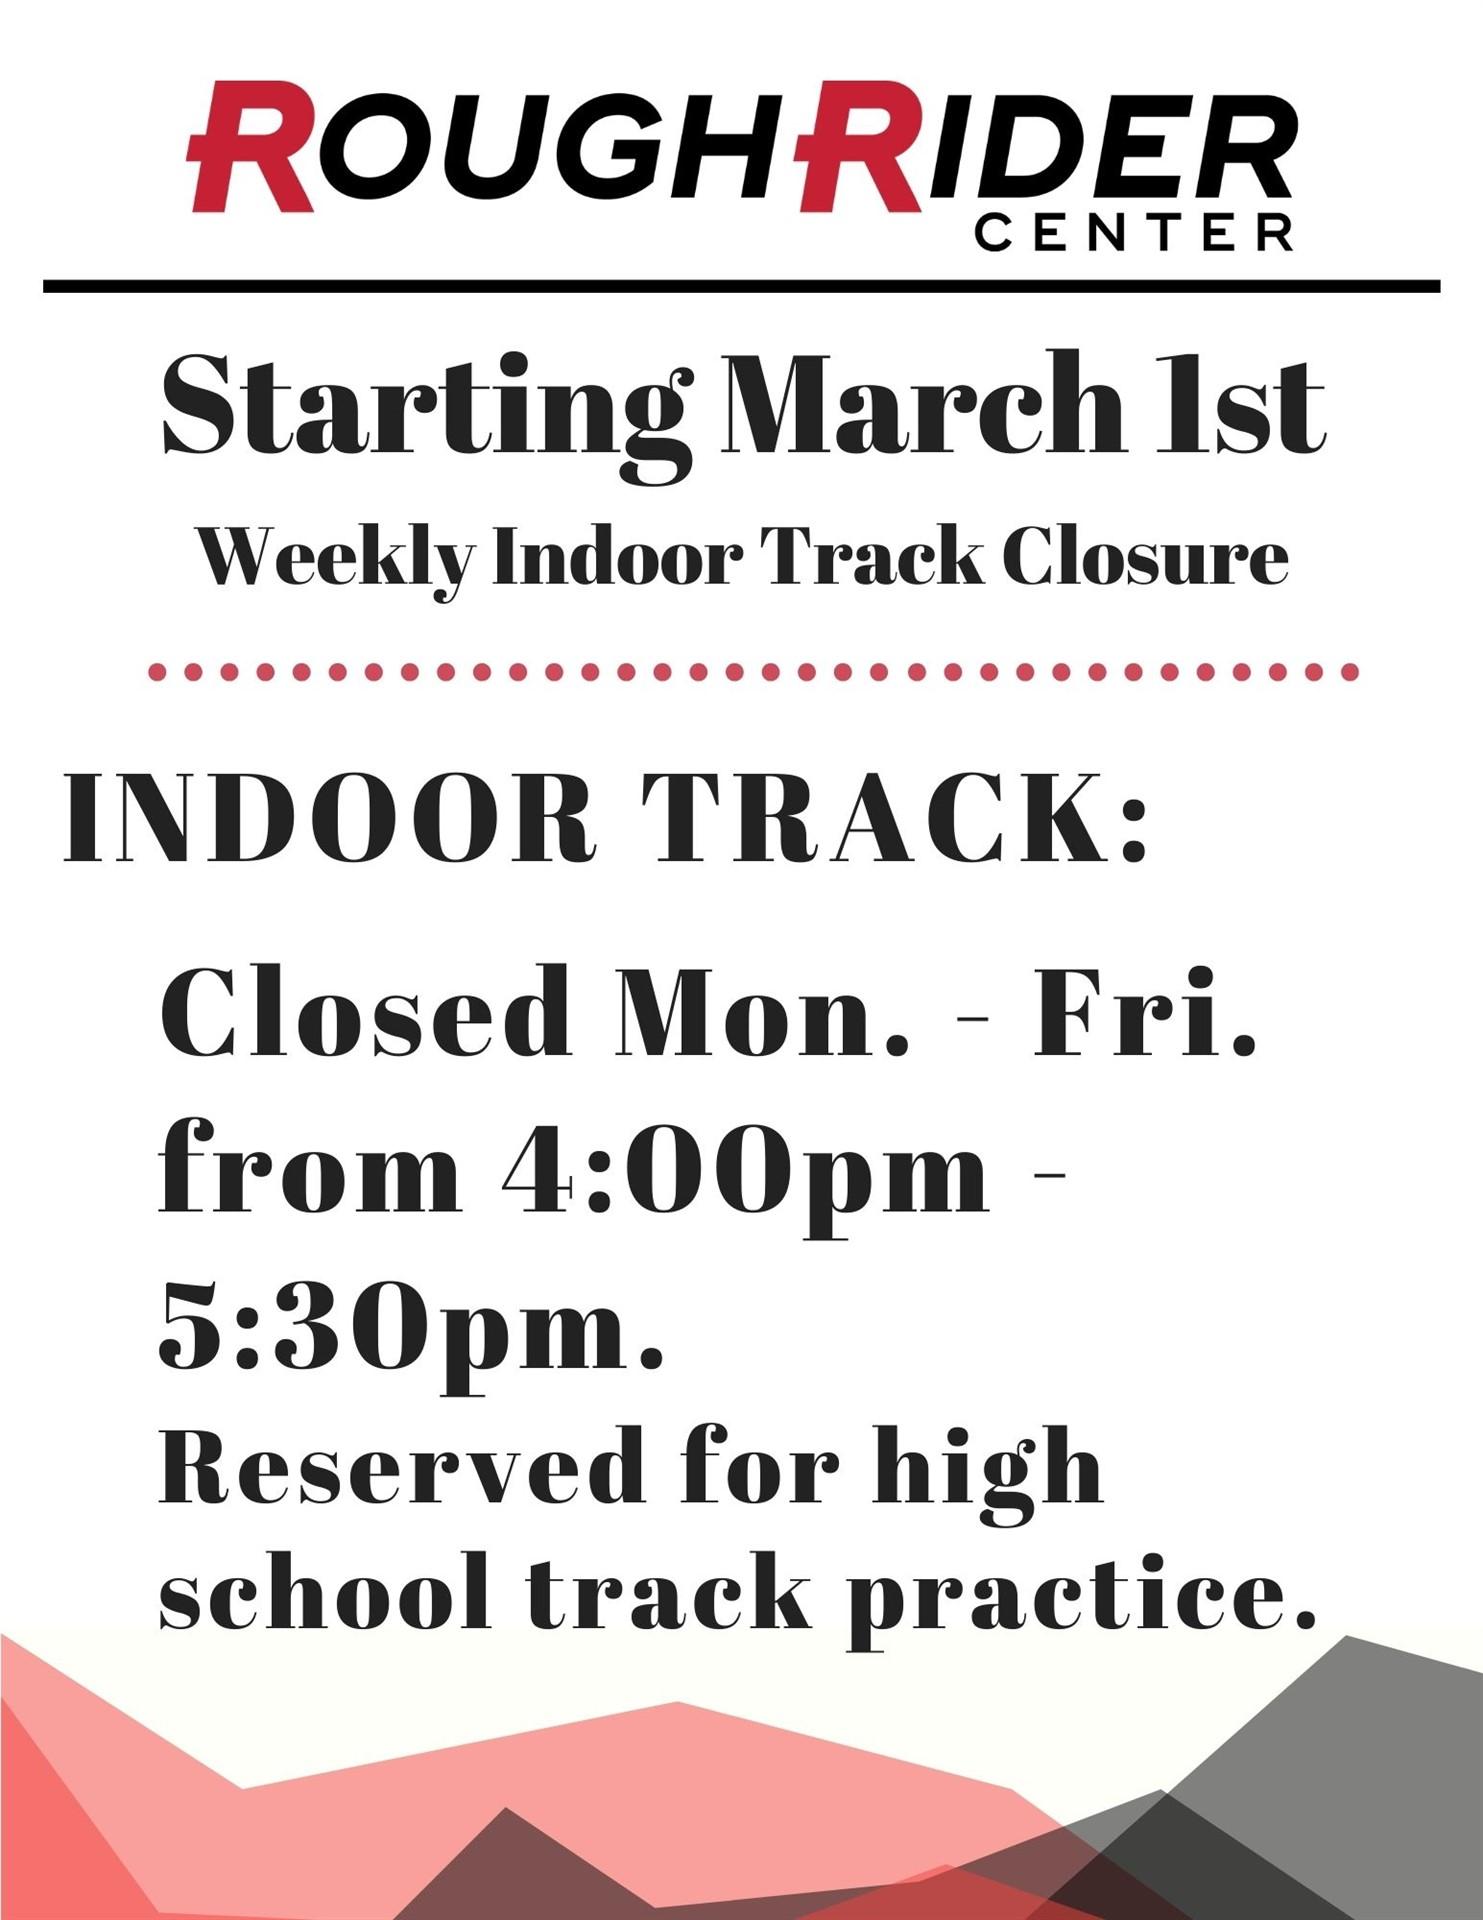 Weekly Track Closure